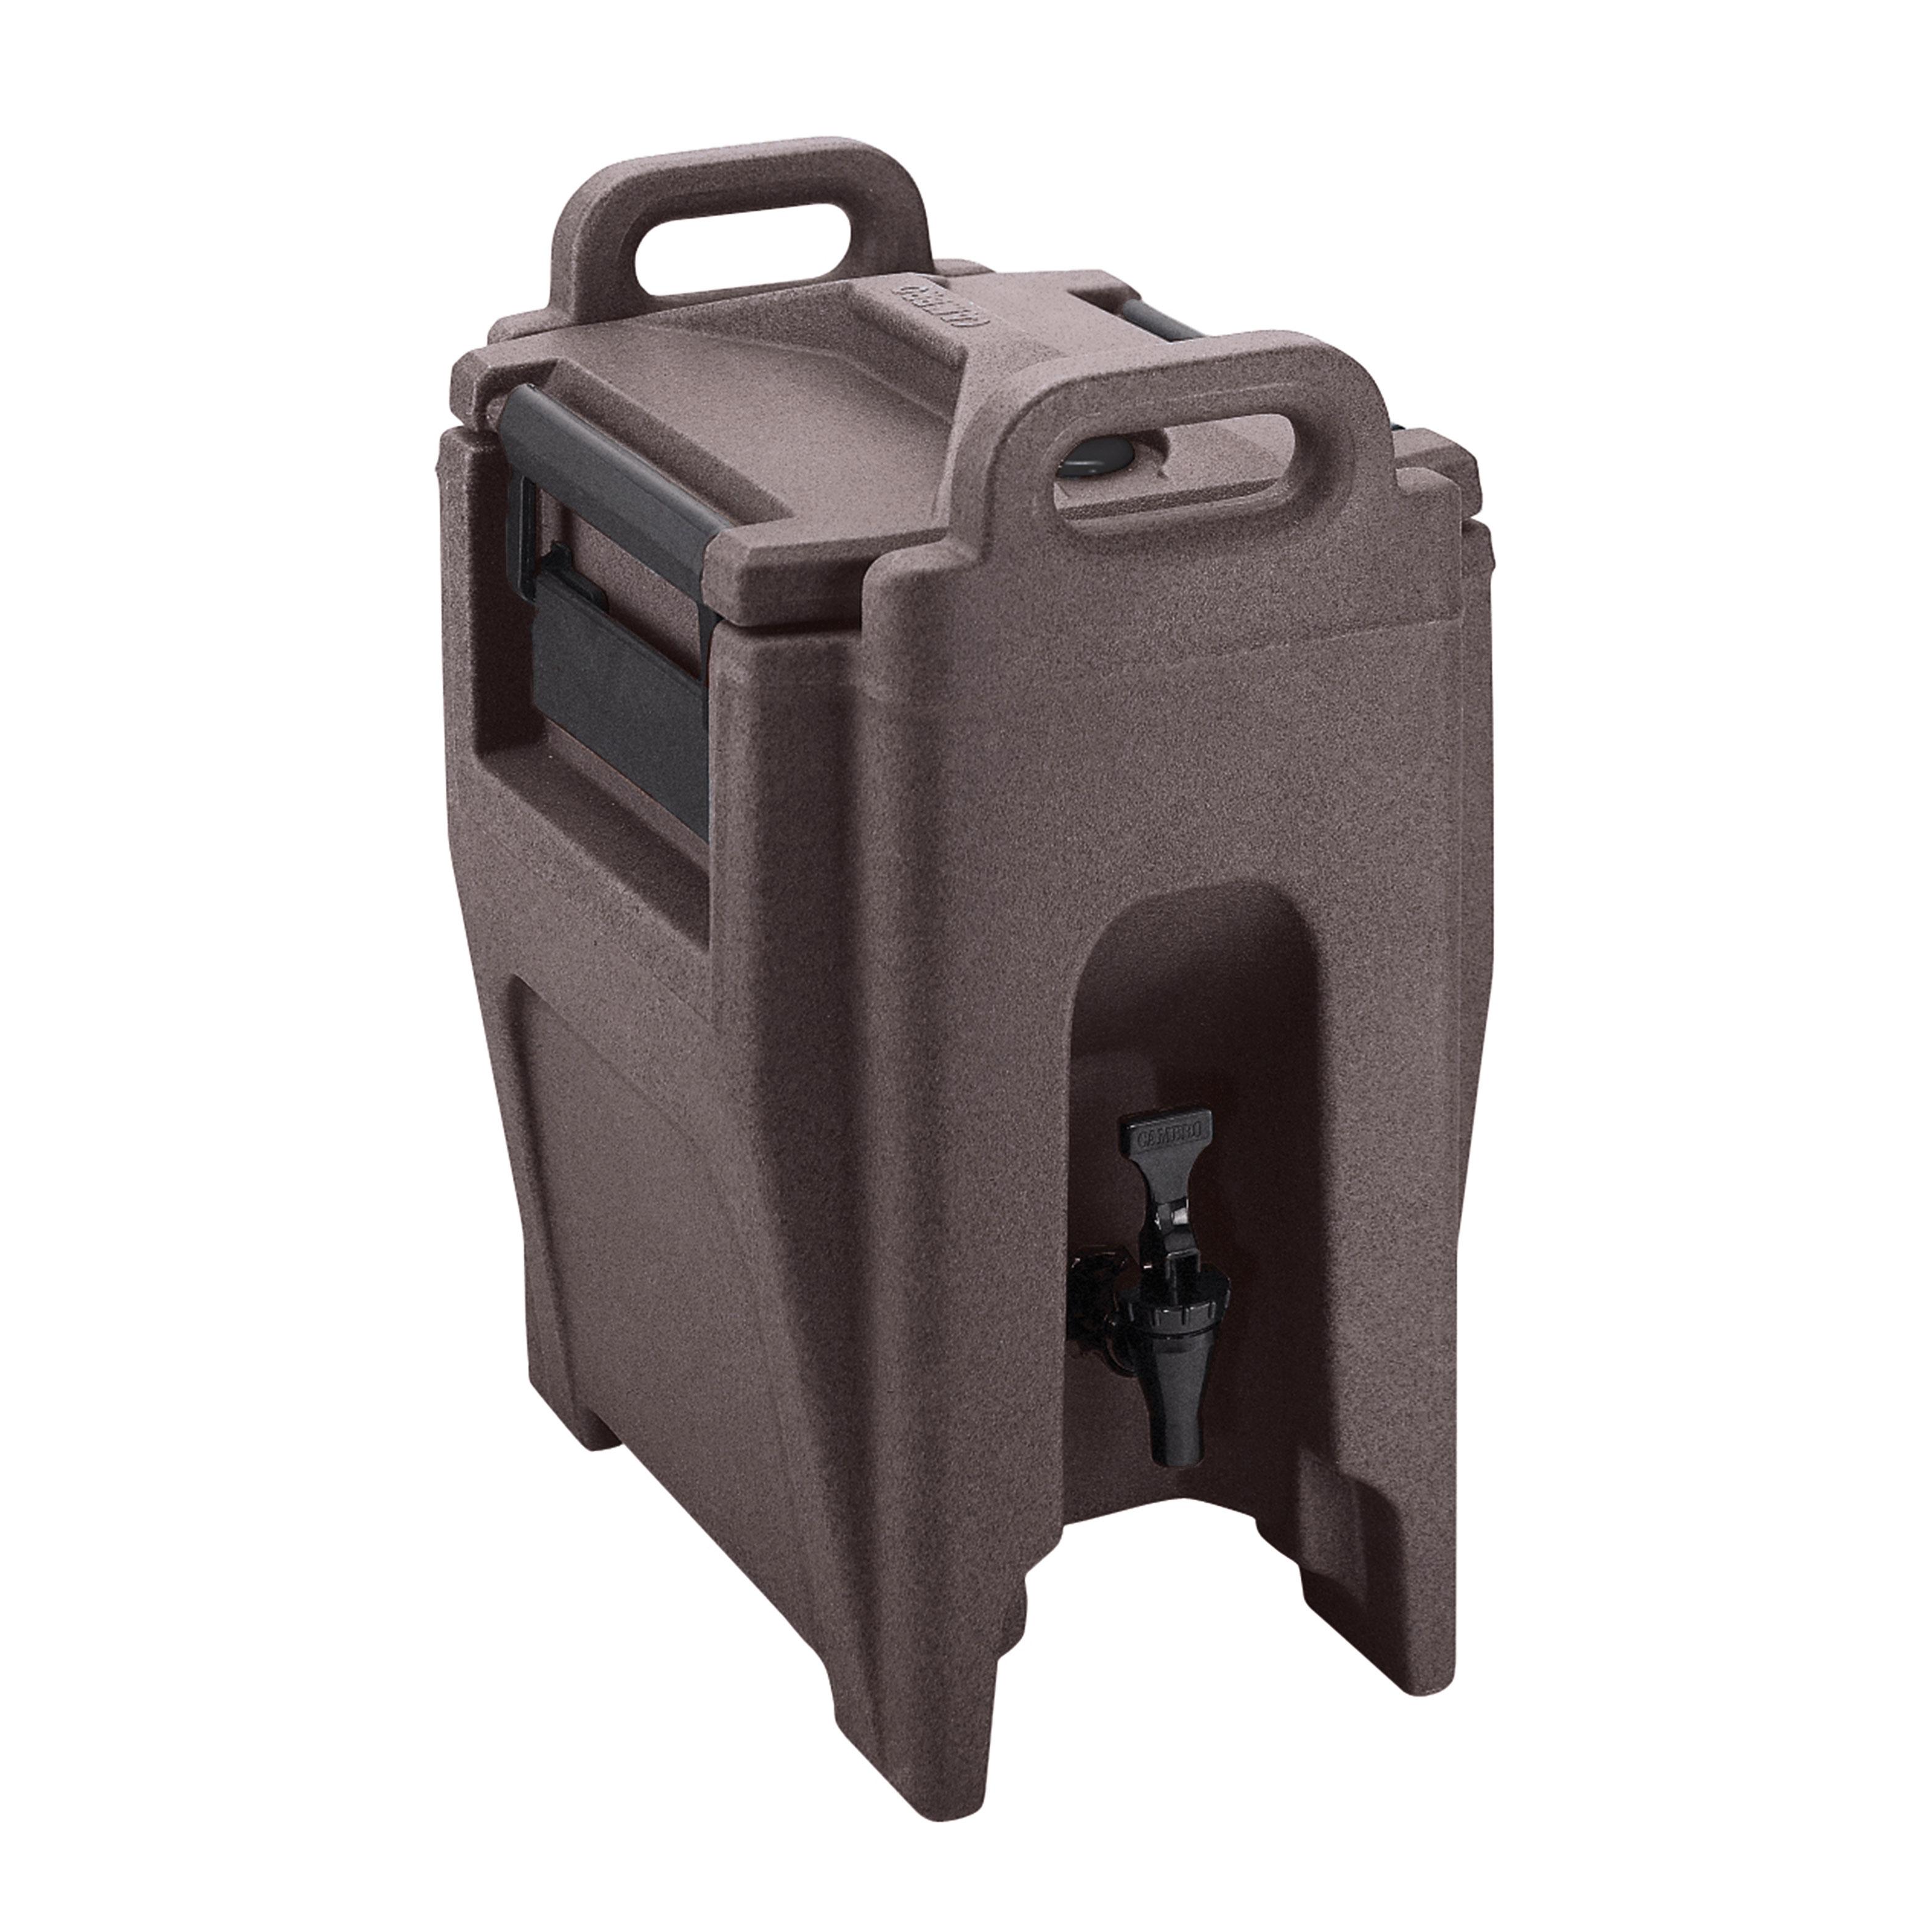 Cambro UC250194 beverage dispensers